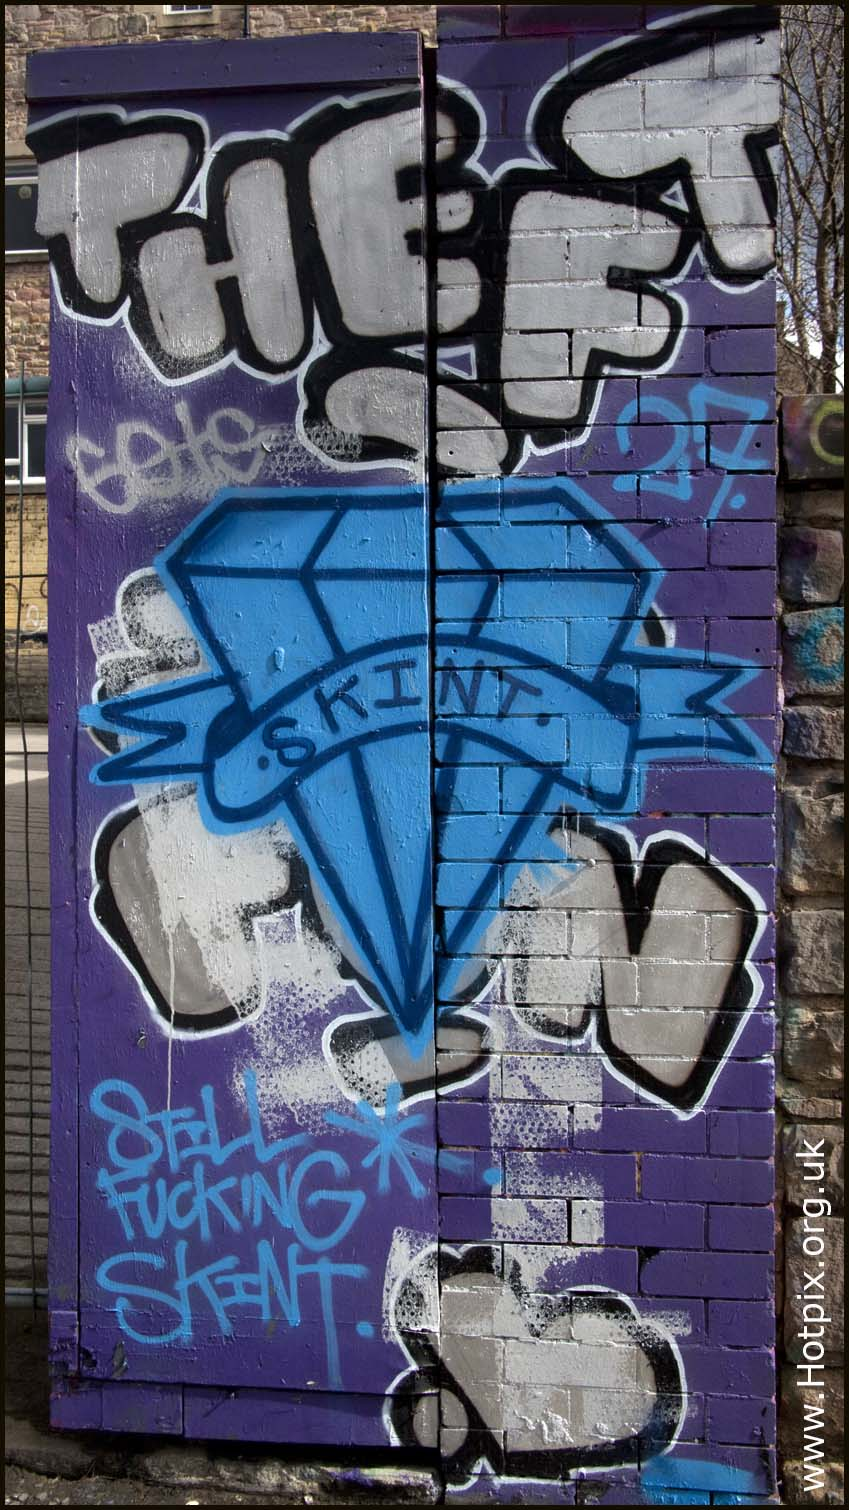 lothian,still,fucking,skint,graffitti,grafitti,graffiti,grafitto,street still,street,art,edinburgh,scotland,city,UK,united,kingdom,spray,paint,arty,artistic,arts,purple,blue,silver,disturbia,tourist,destination,scottish,escotia,NRSP,edinbrugh,hotpix!,Edinburg,edimburgh